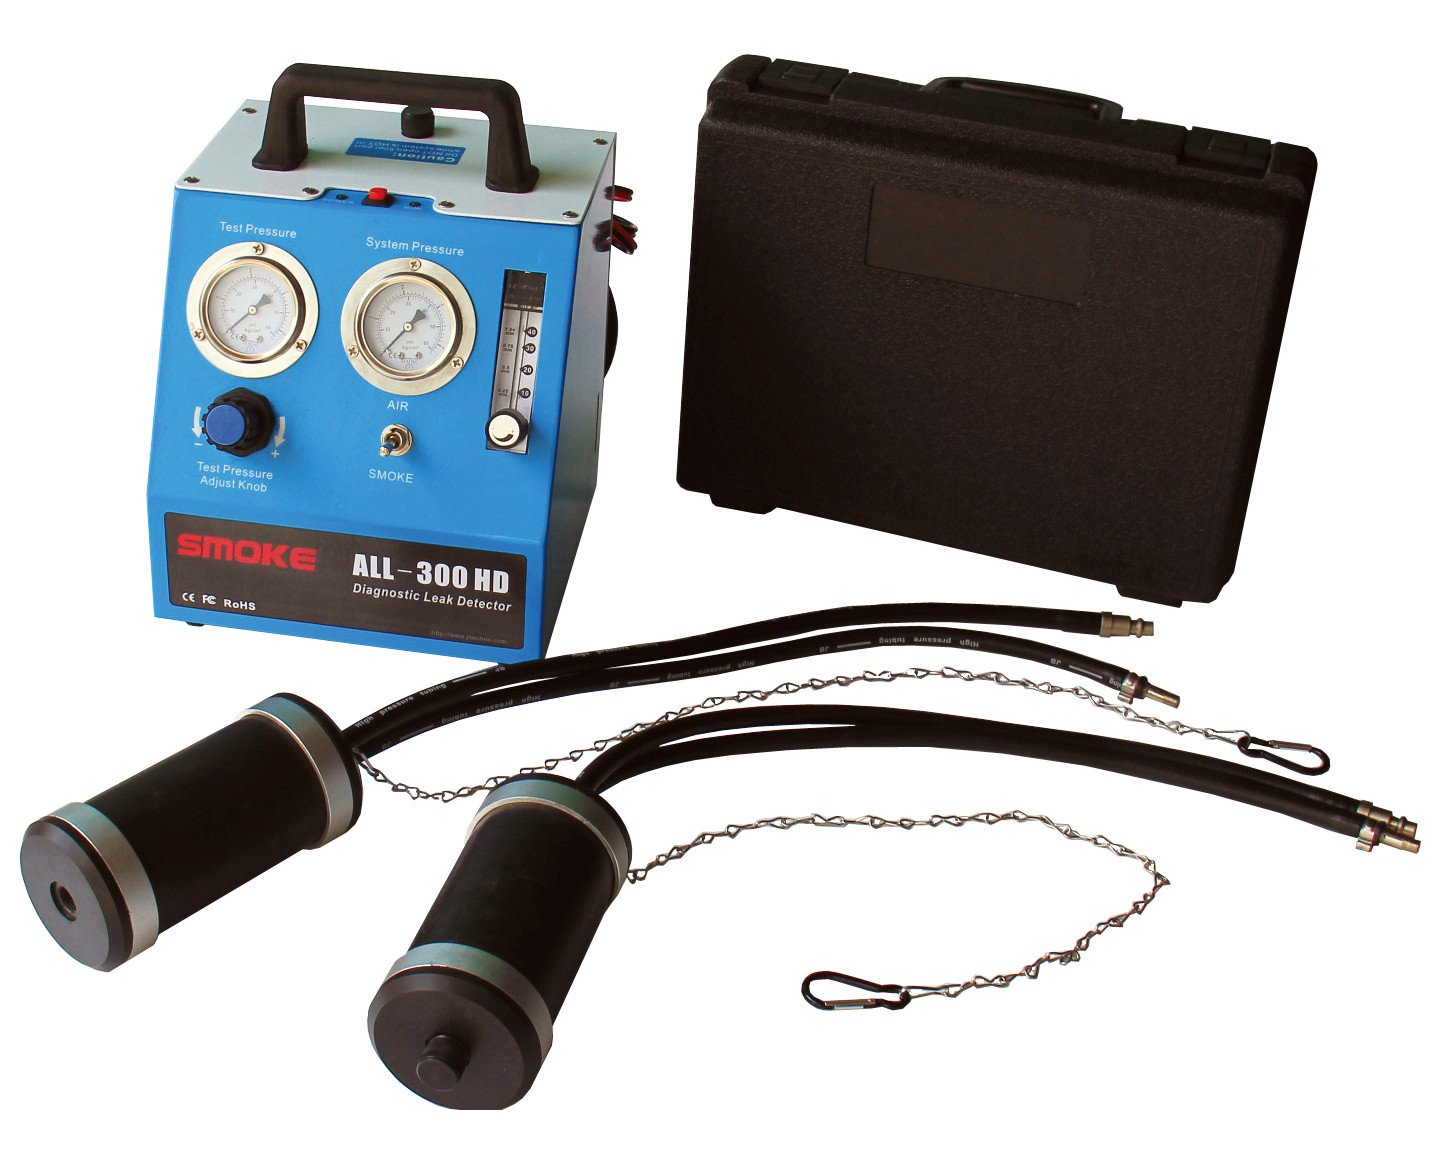 ALL-300 HD Diagnostic Leak Detector for Car/Heavy Duty Automotive Smoke Leak Locator (Heavy Duty)